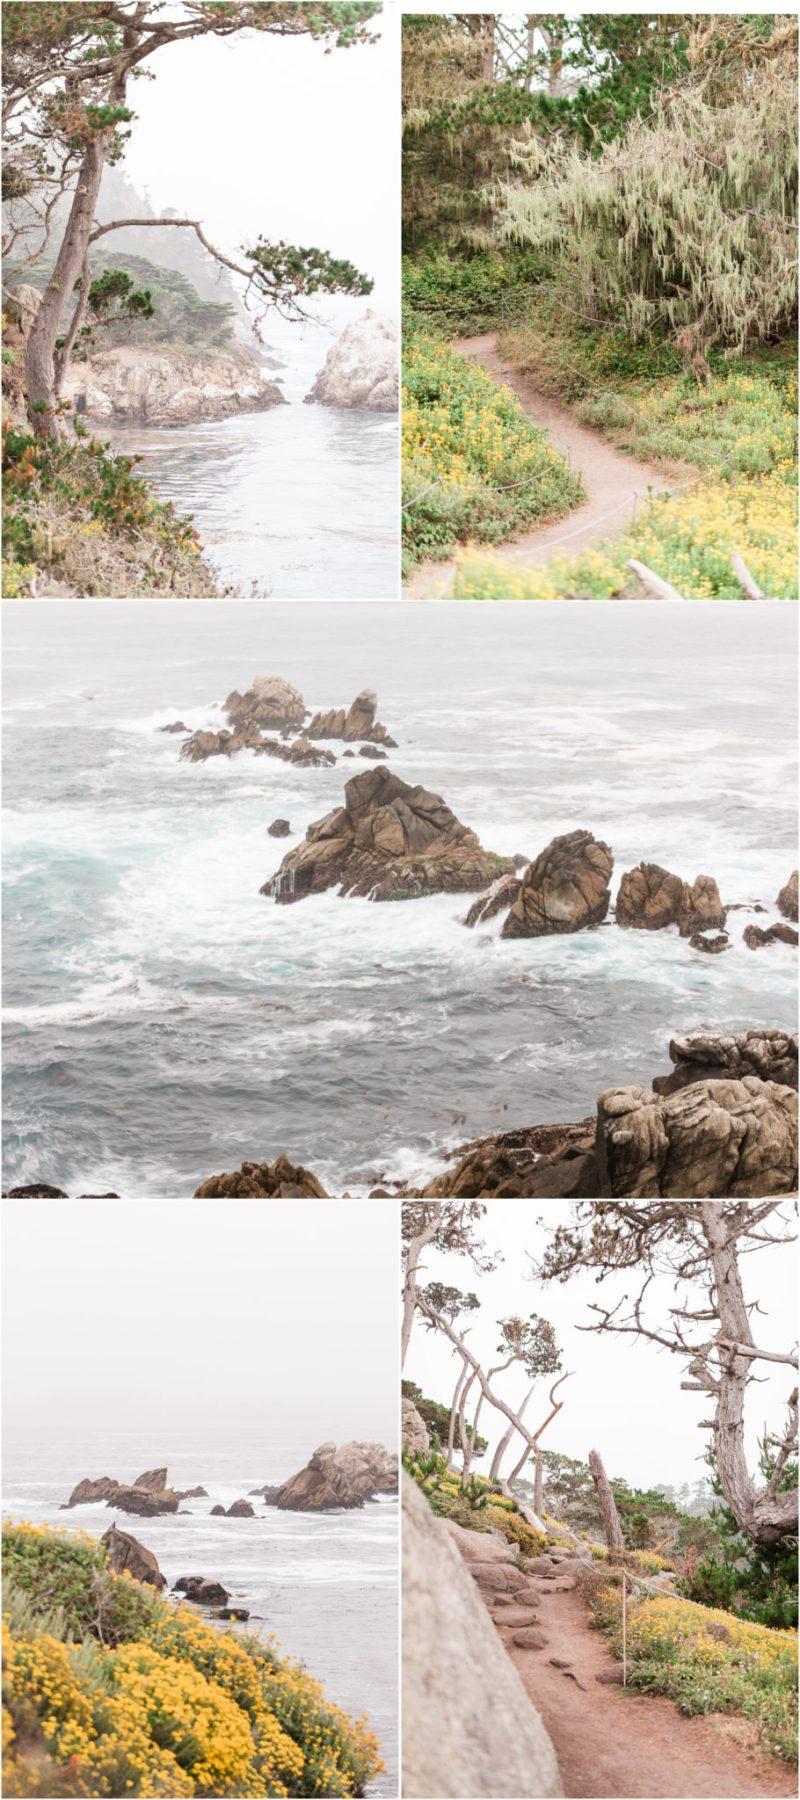 Point Lobos State Natural Reserve Carmel California